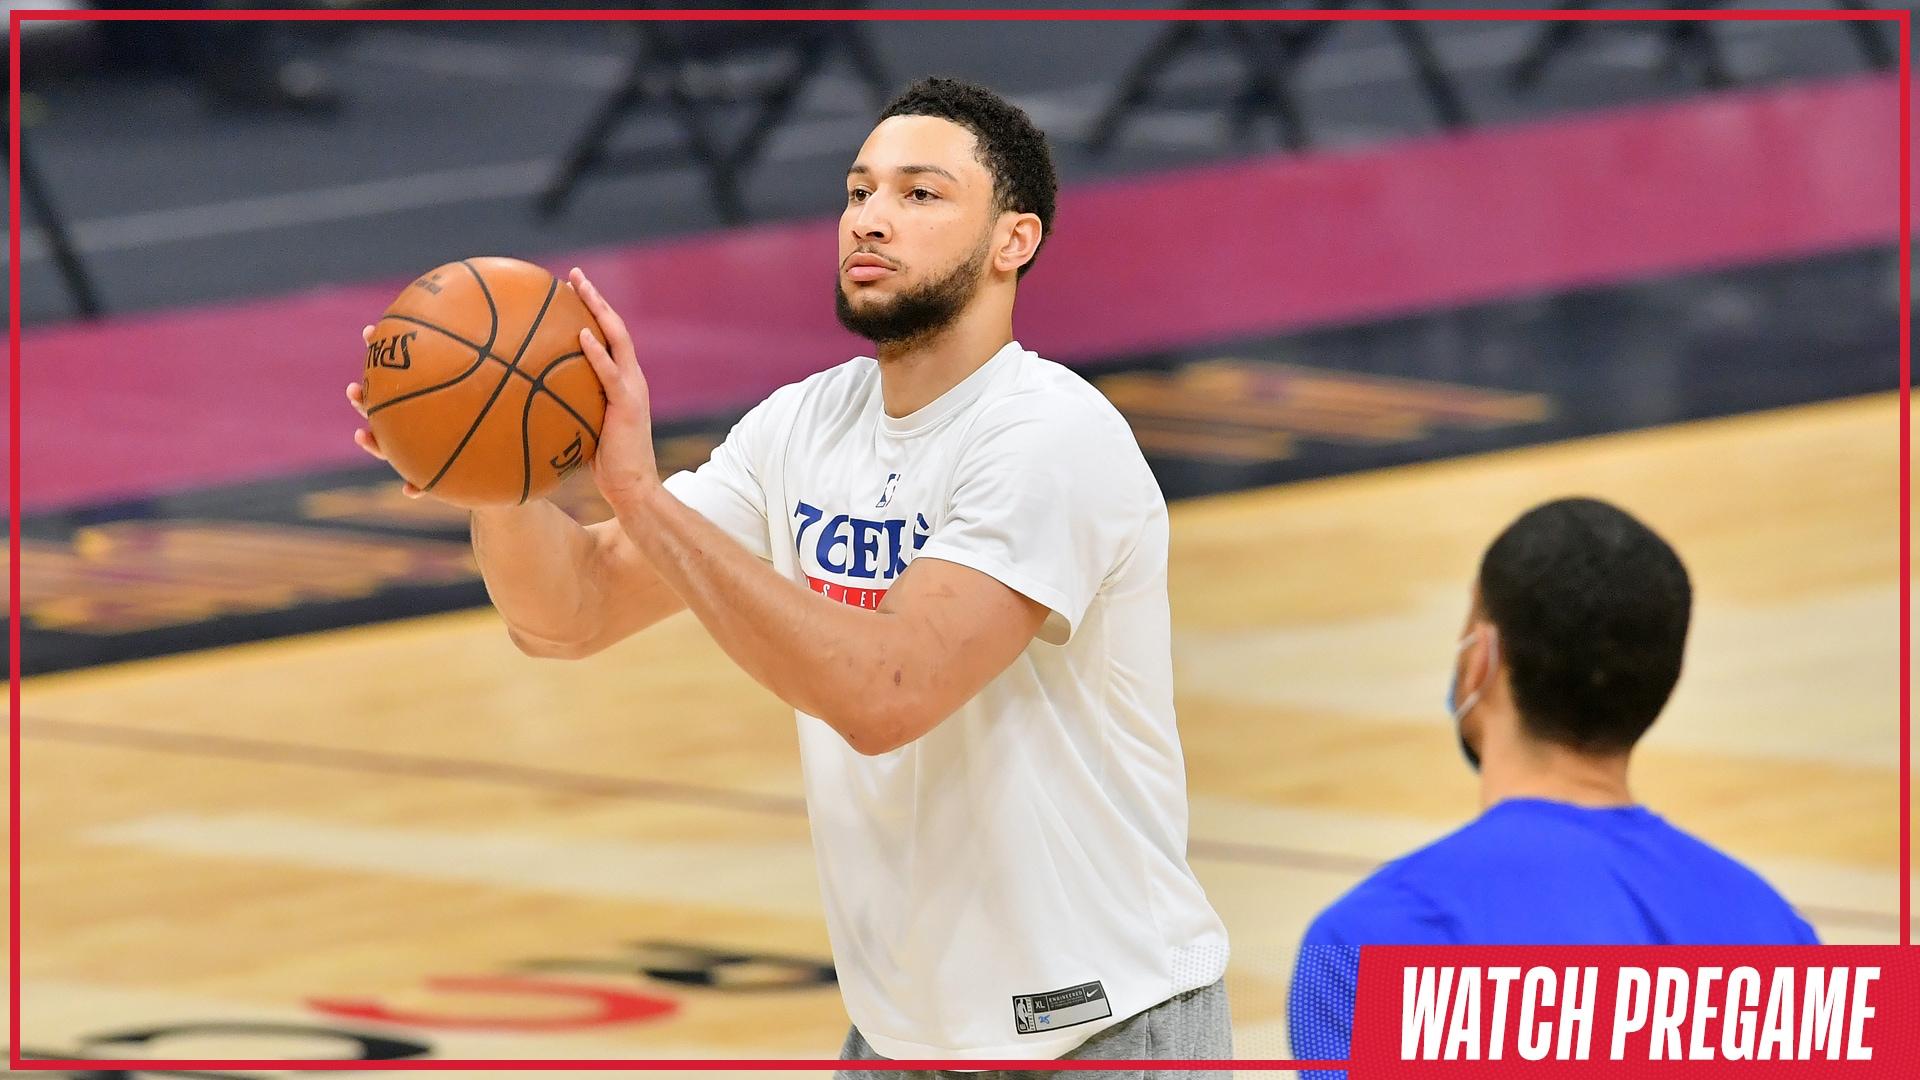 Watch Free: Pelicans vs. 76ers Pregame